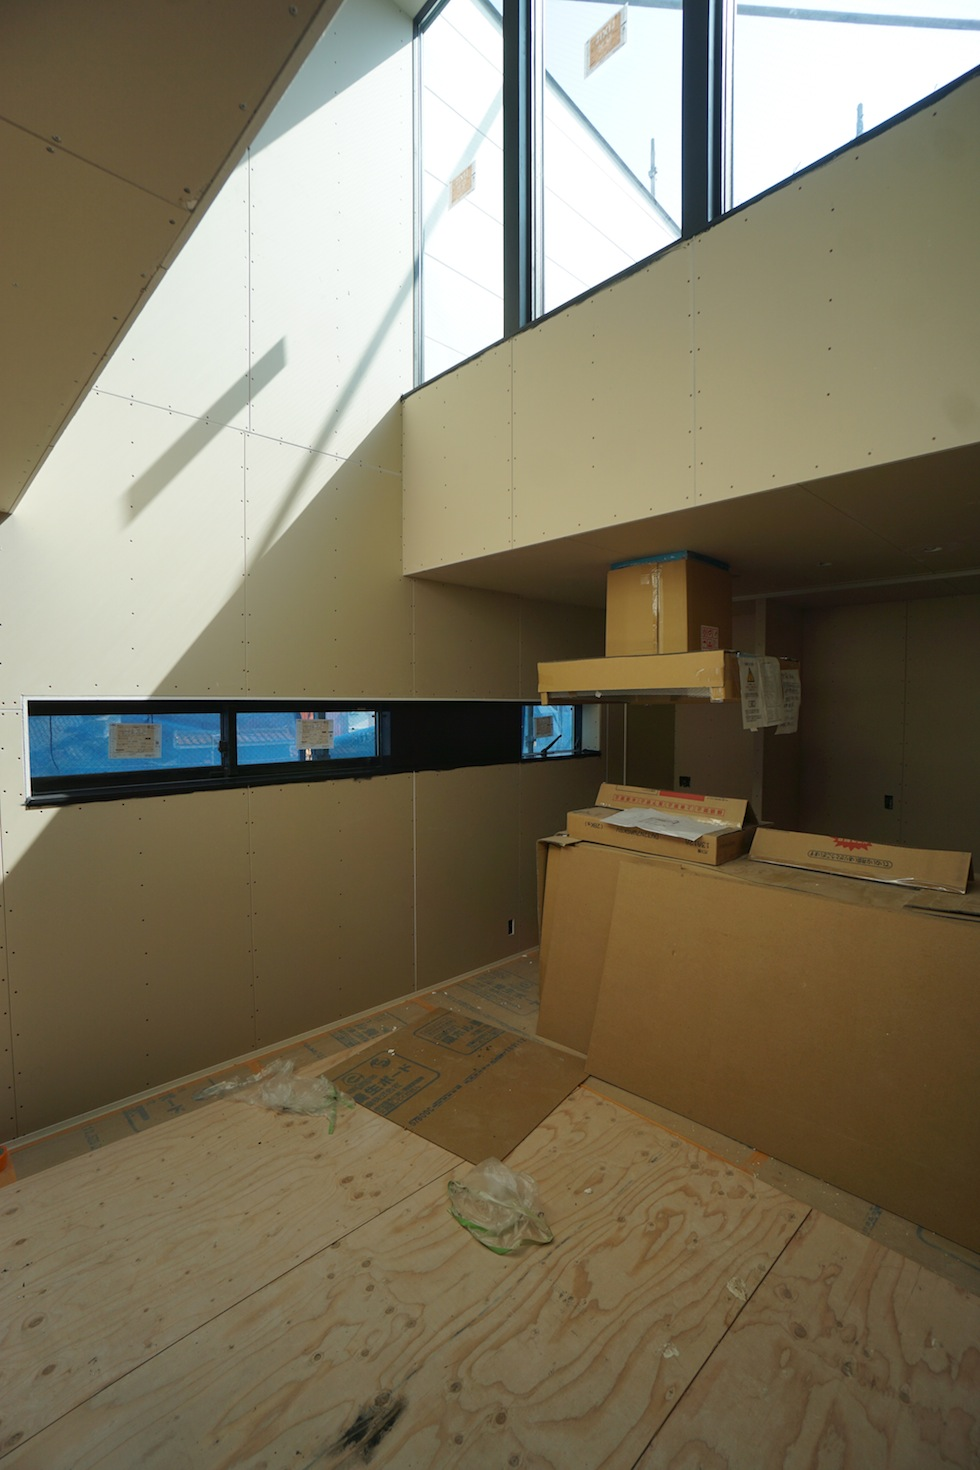 高級注文住宅,設計事務所,建築家,大阪,京都,神戸,木造3階建て,デザイン,吹き抜け